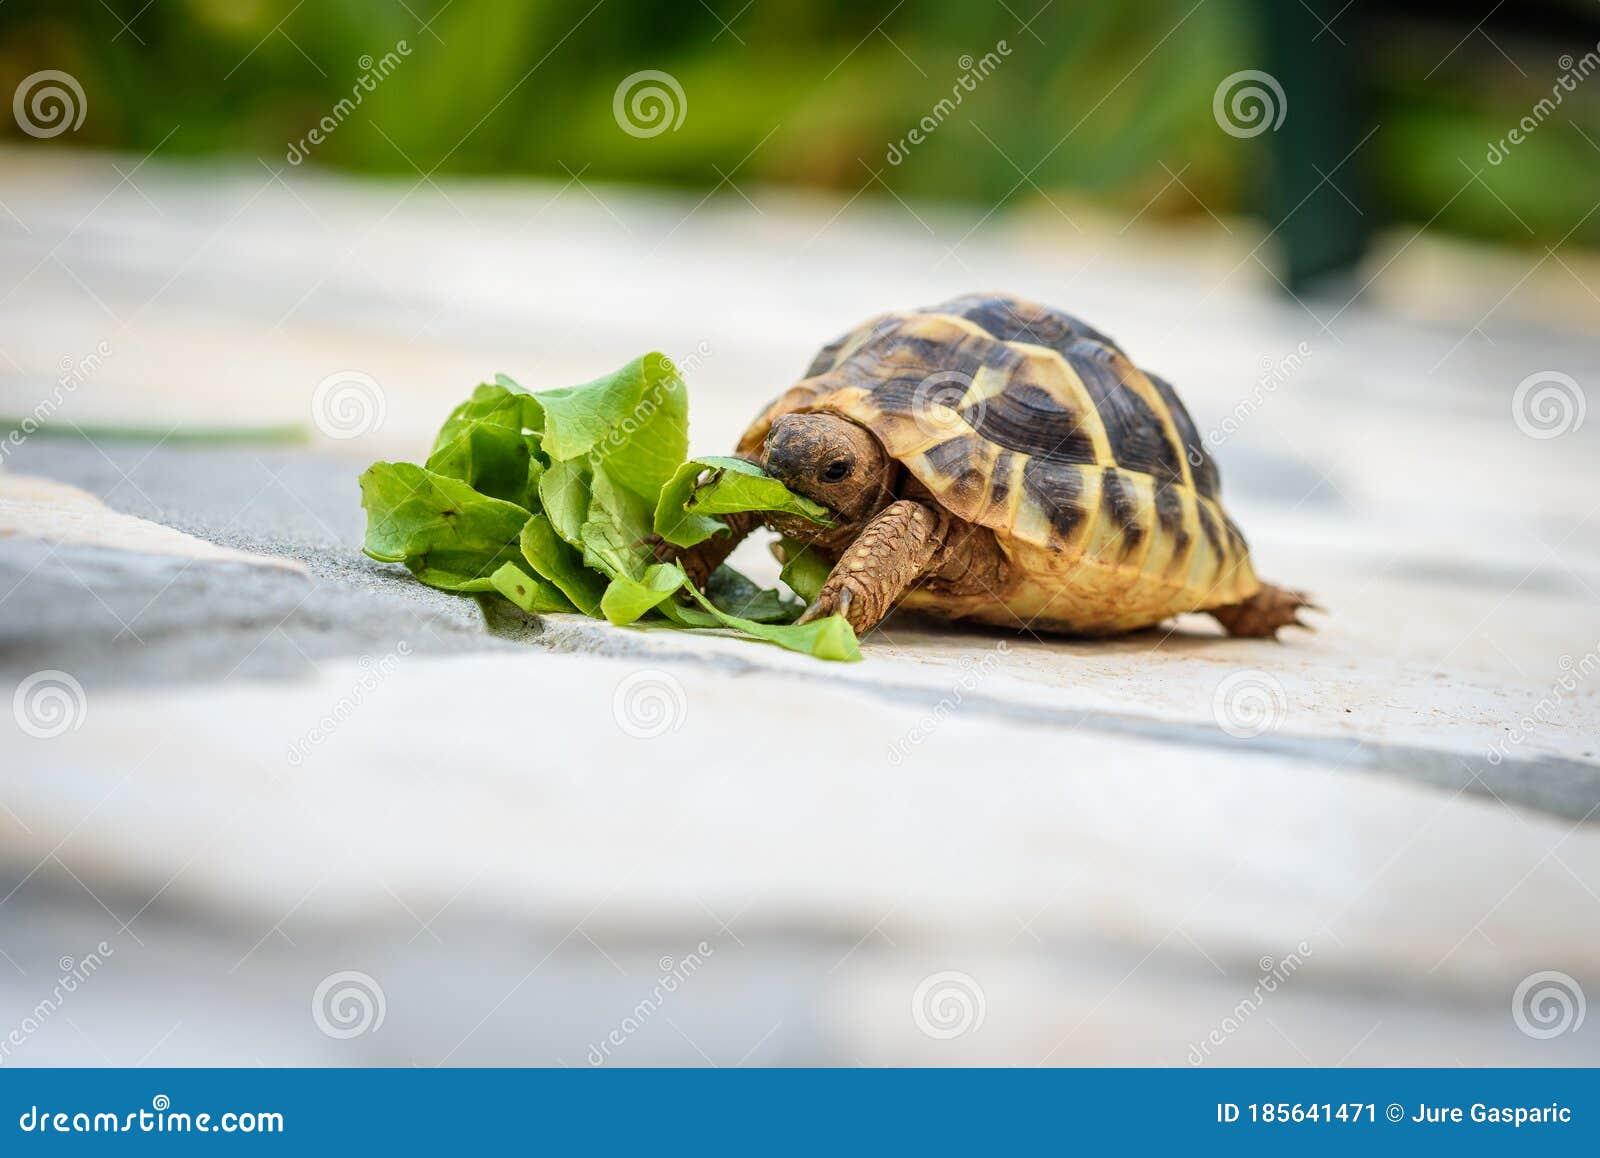 Pet Turtle Eating Lettuce Salad On Stone Paved Terrace Stock Image Image Of Slow Head 185641471